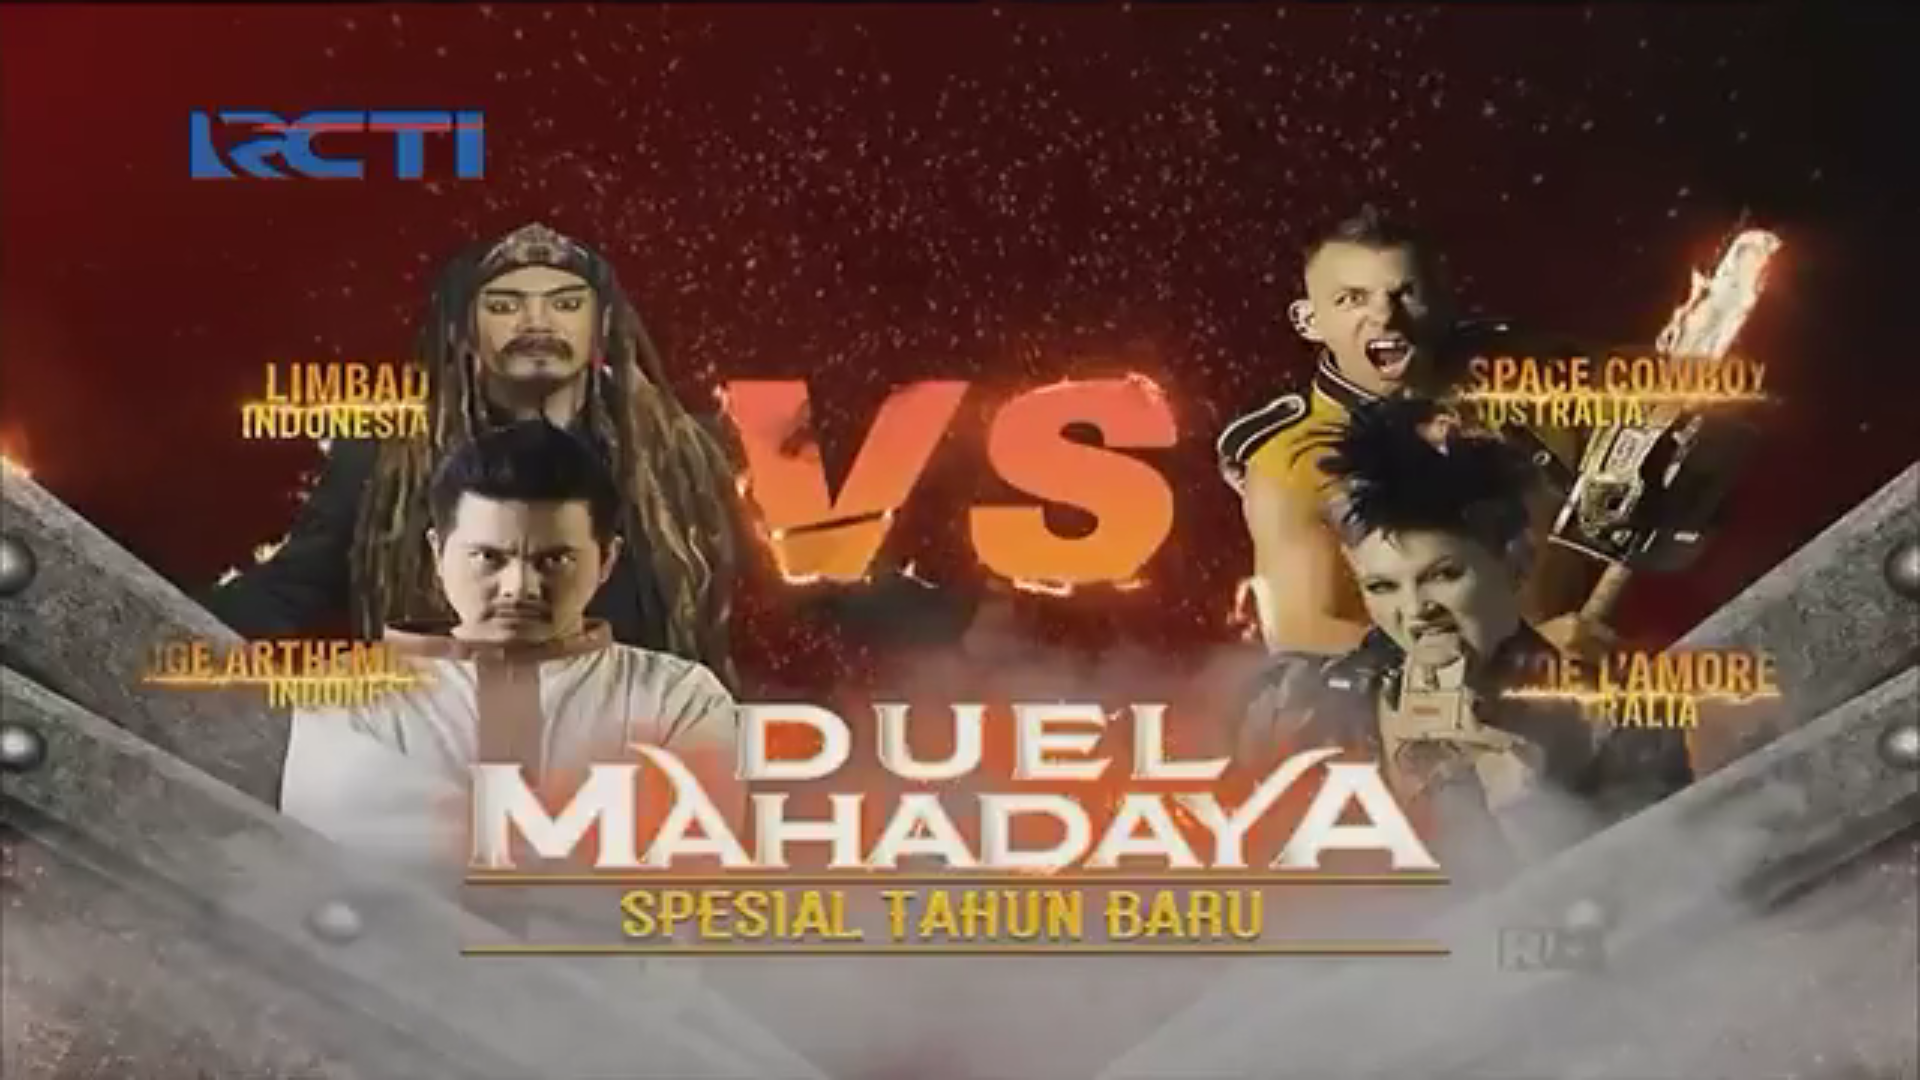 Duel Mahadaya